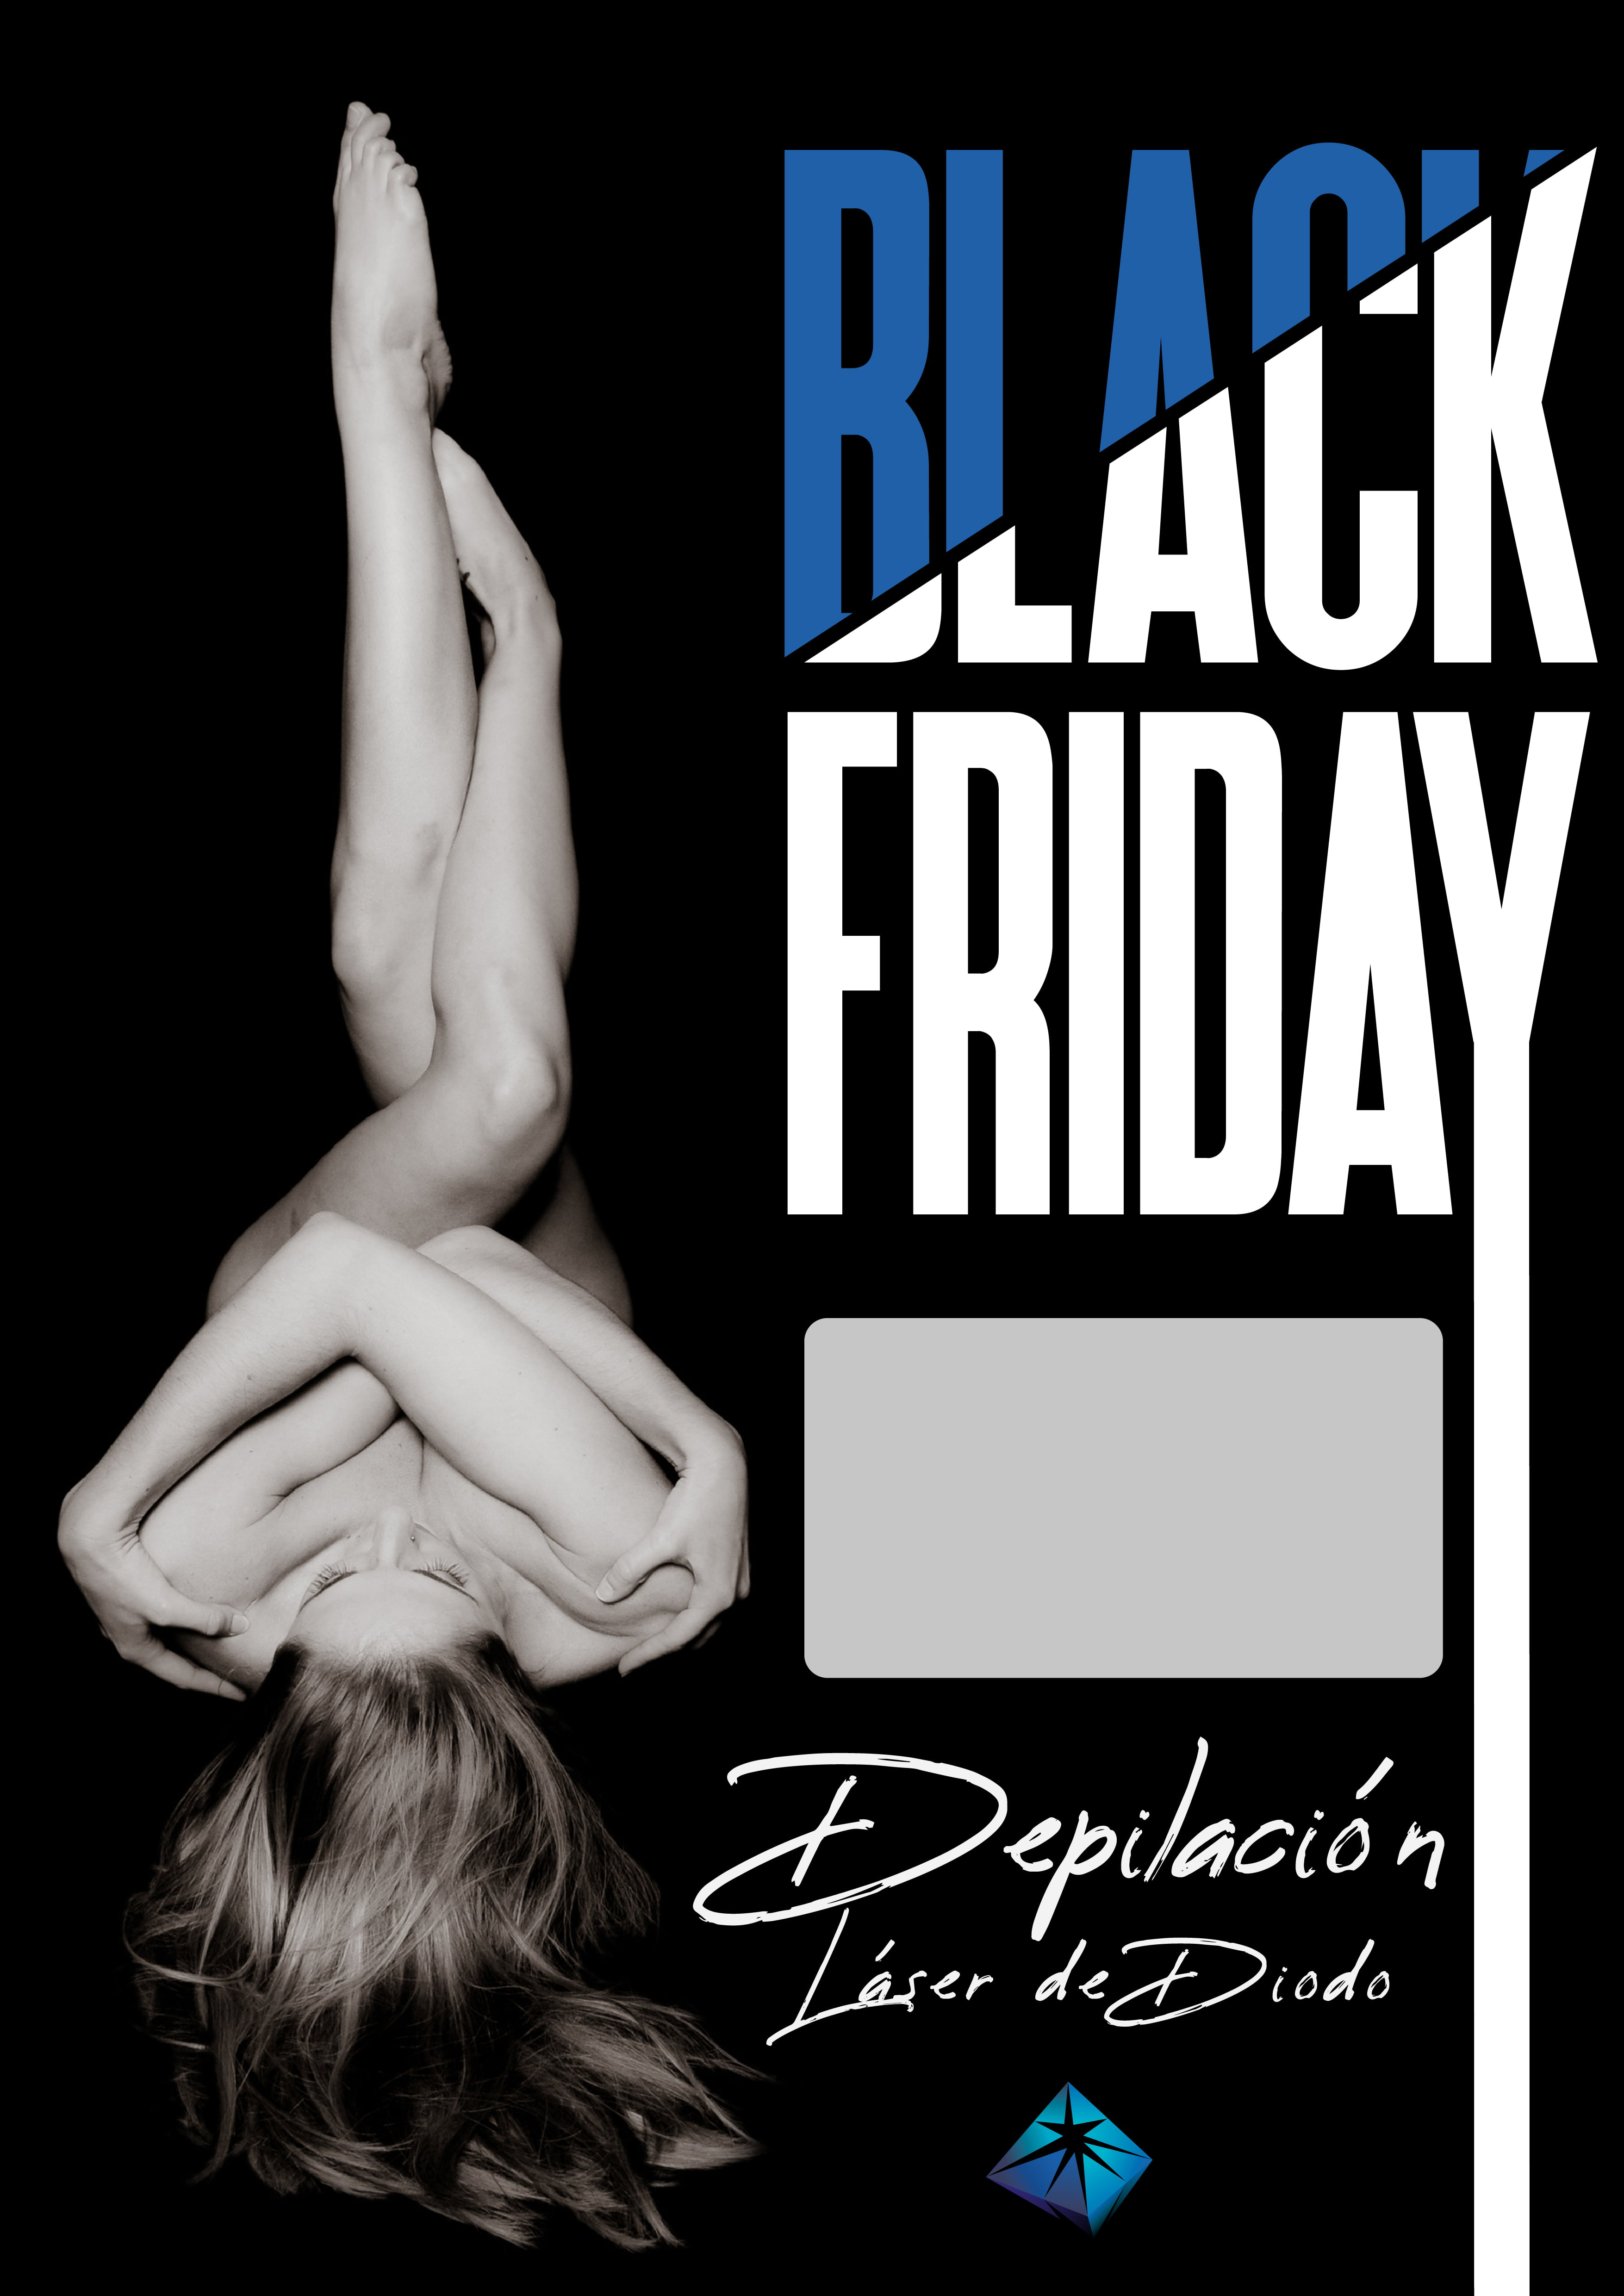 black friday 2019 Sapphire Depilacion